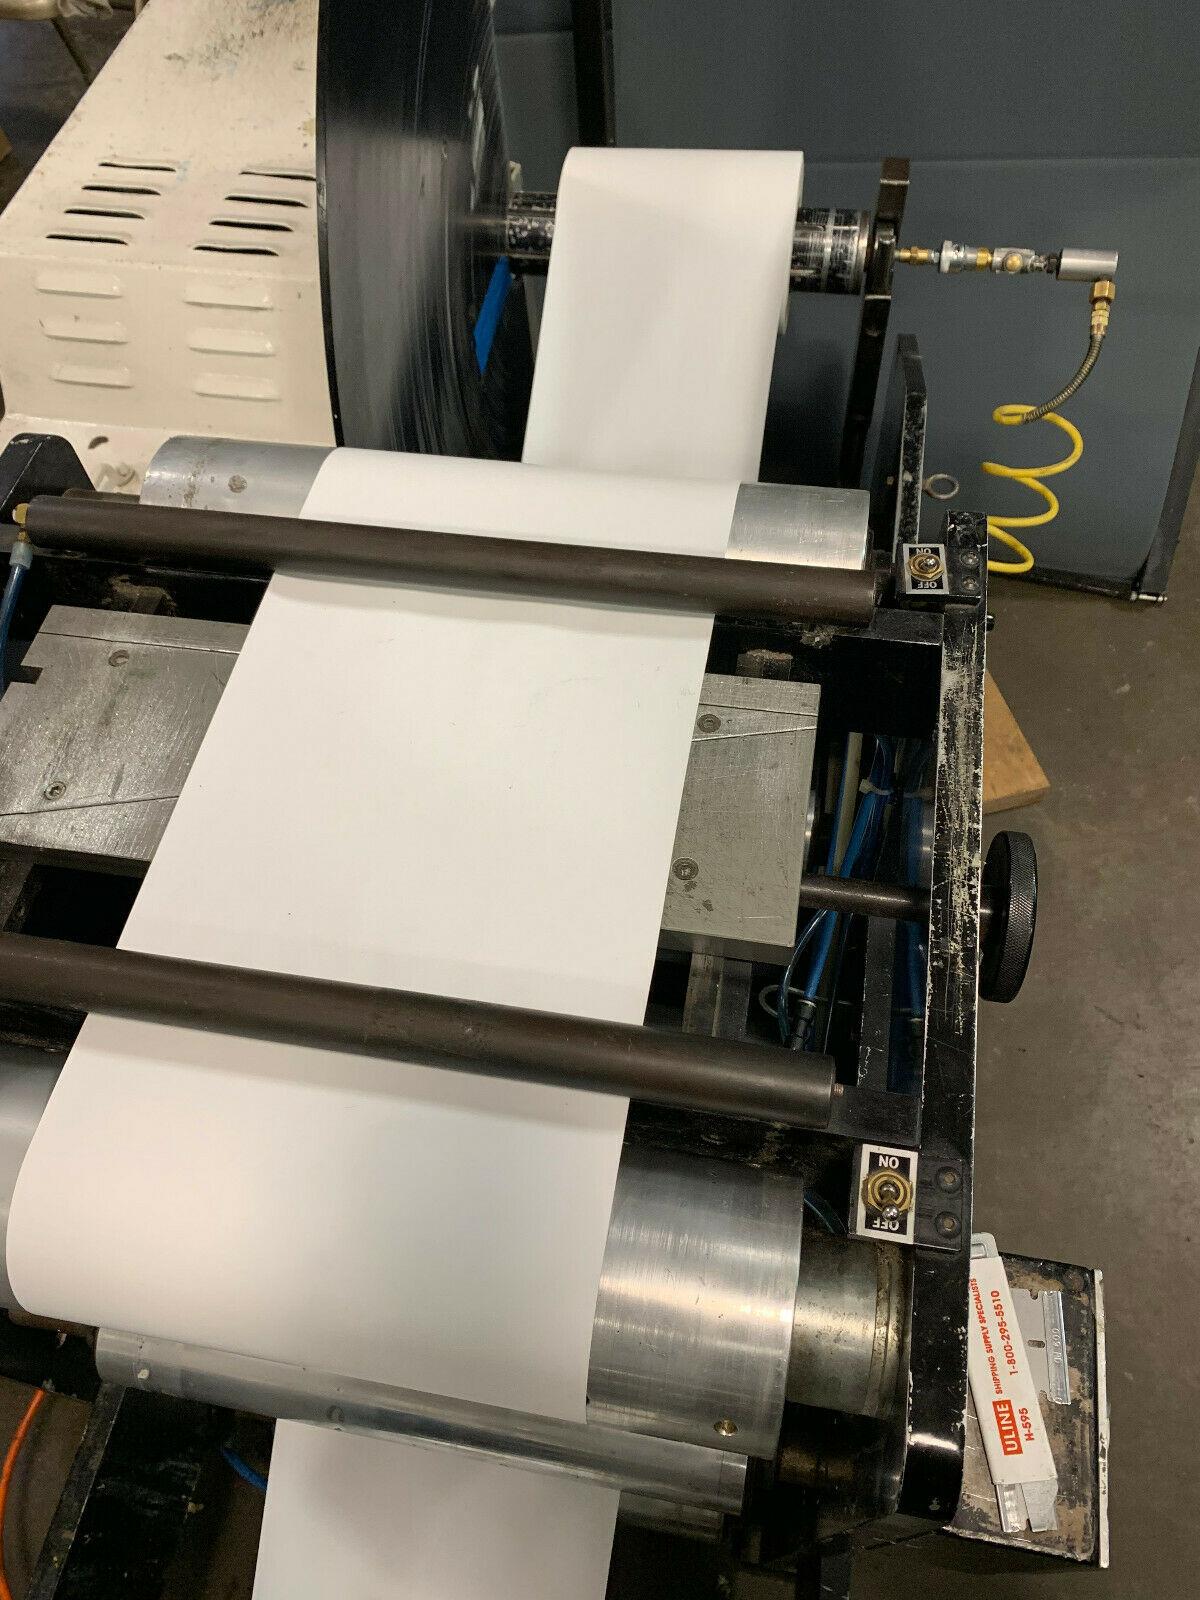 Rotoflex DLI330 - Used Flexo Printing Presses and Used Flexographic Equipment-7